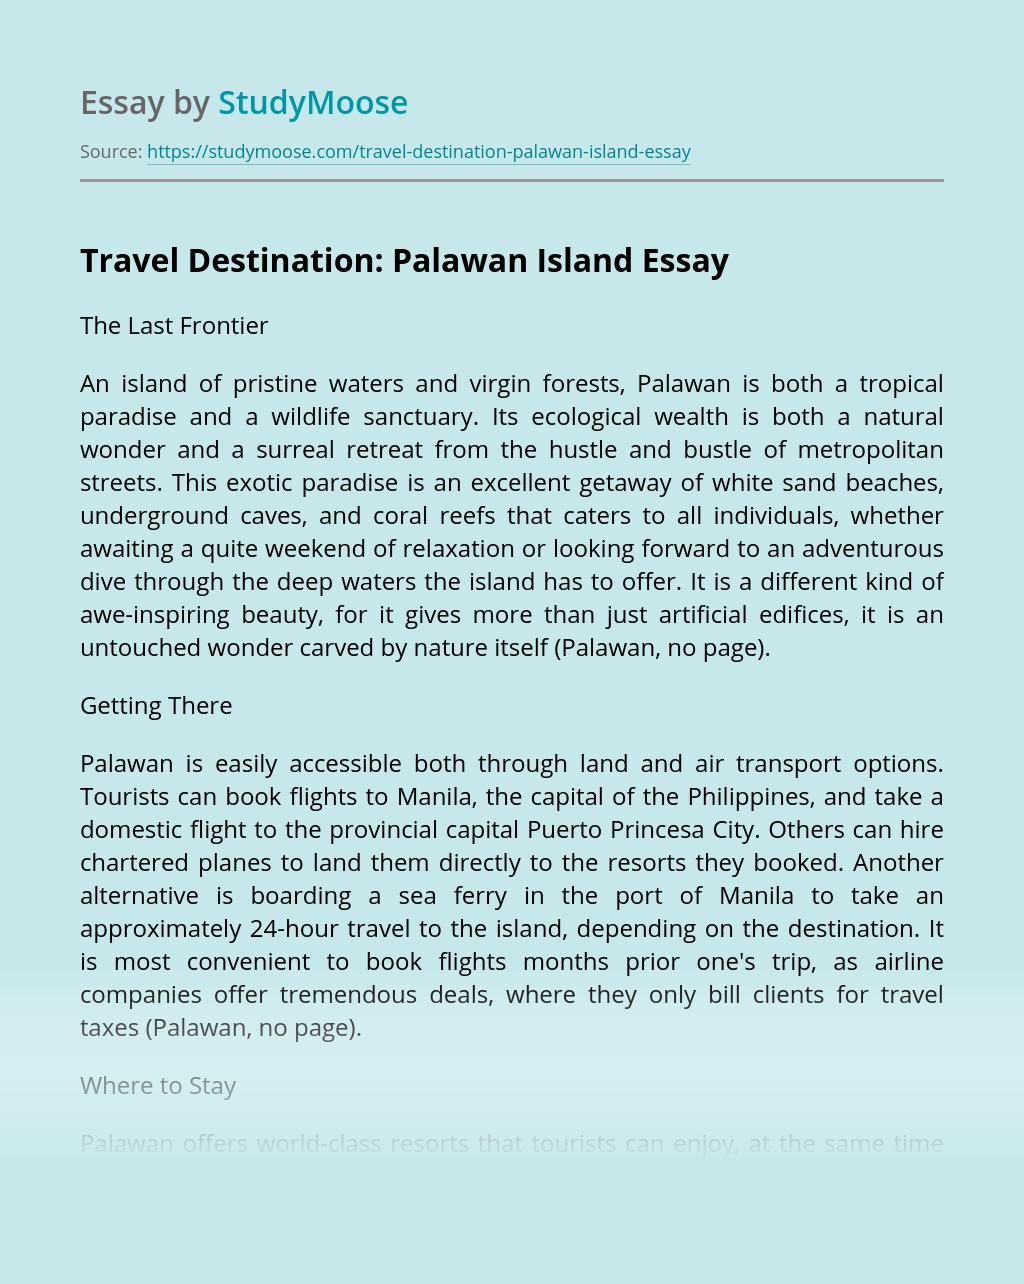 Travel Destination: Palawan Island